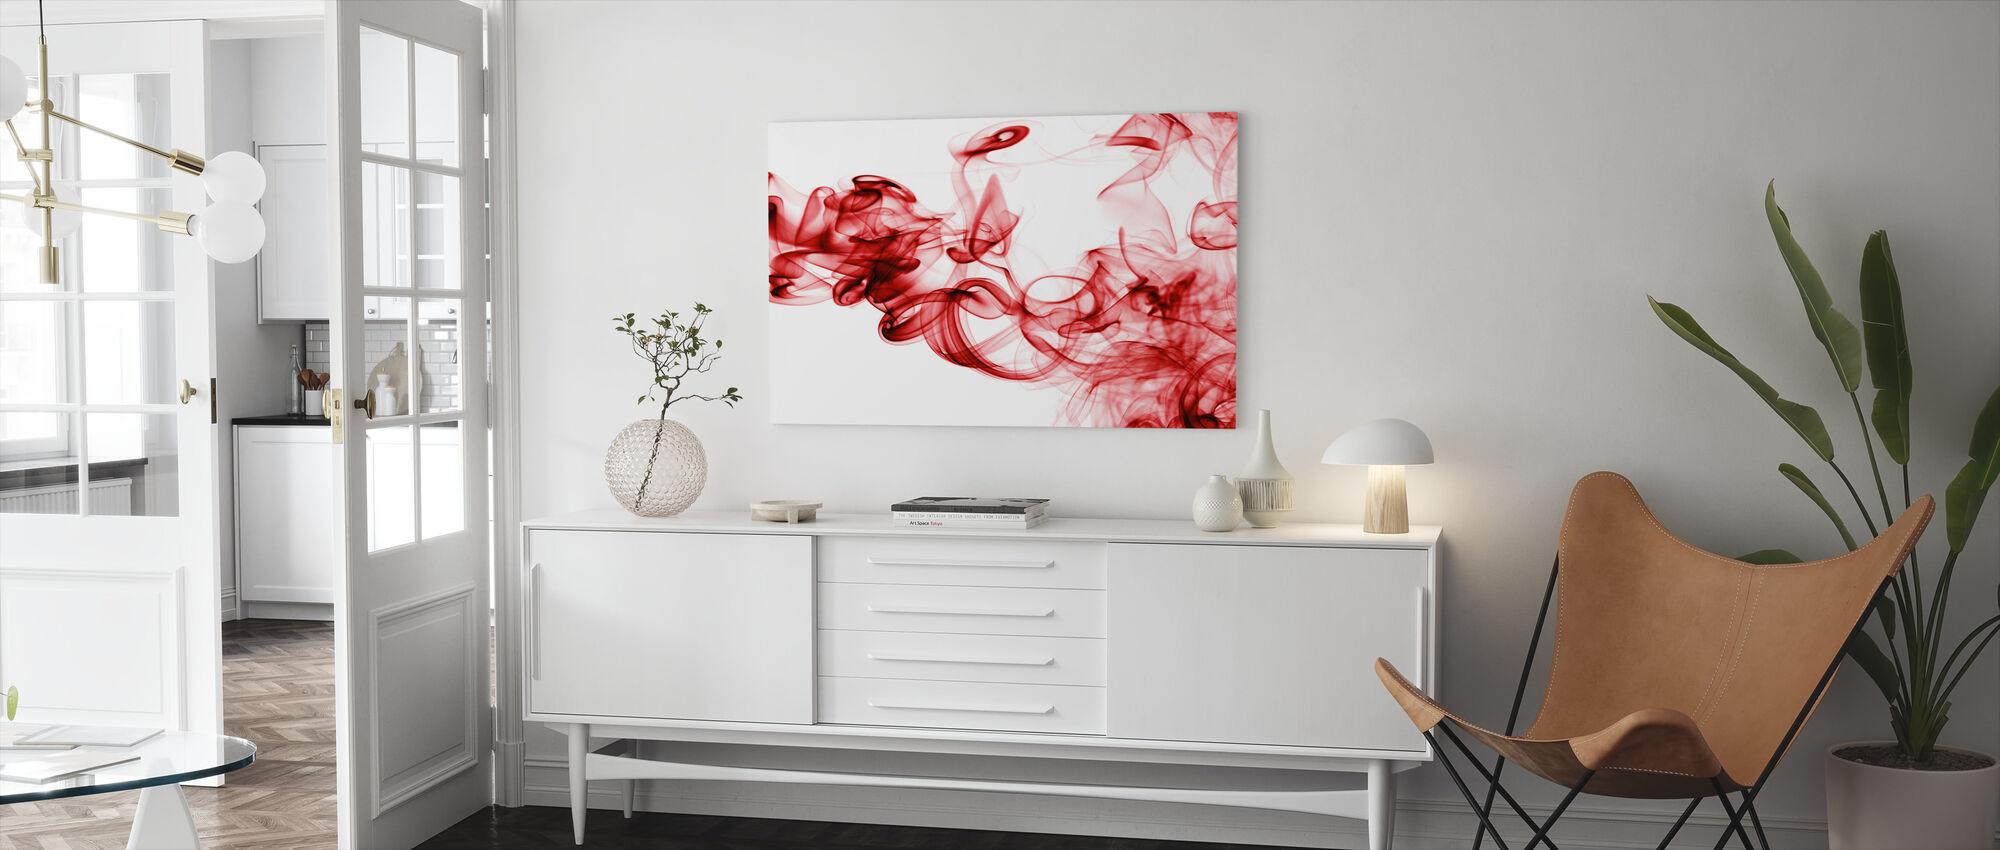 Red Smoke - Canvas print - Living Room